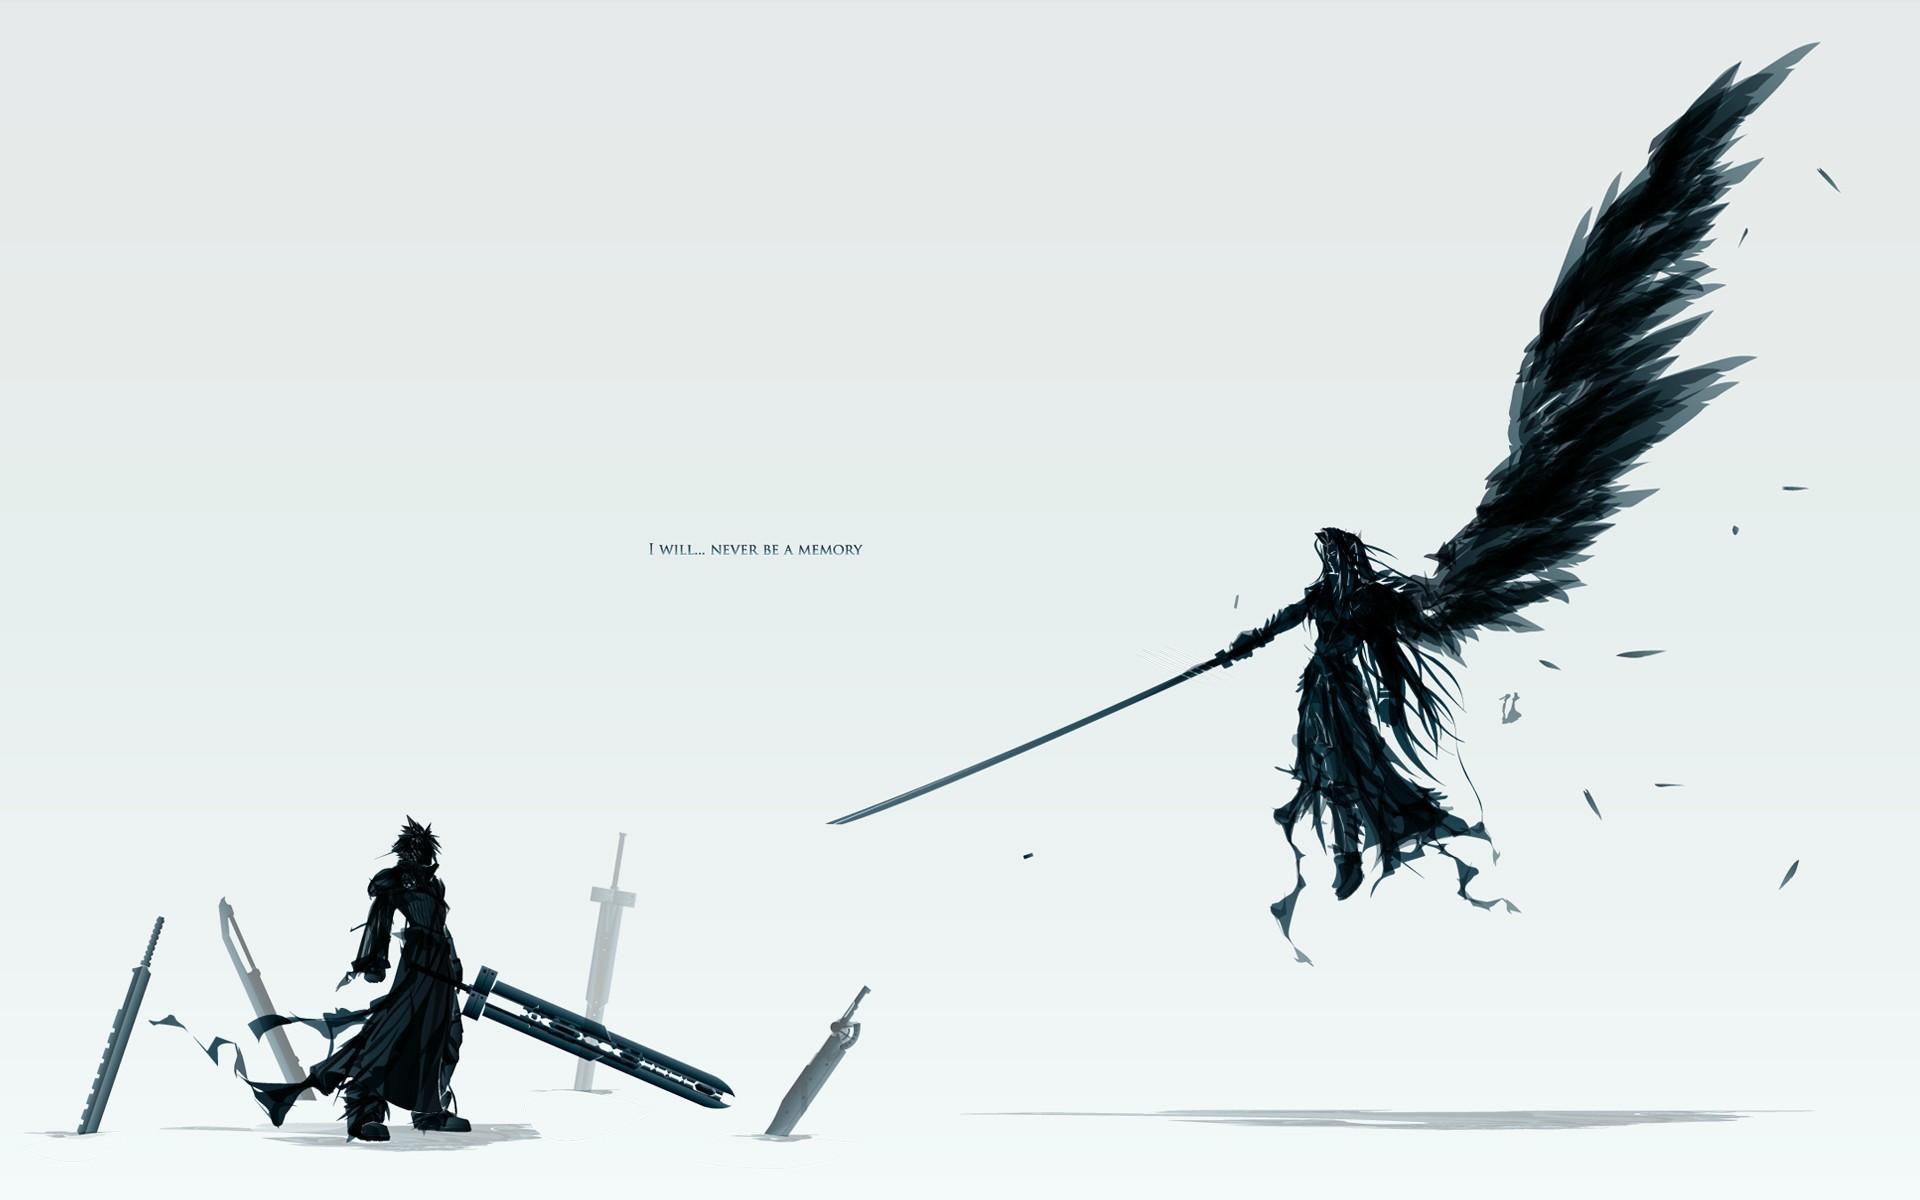 wallpaper Final Fantasy · Sephiroth · Cloud Strife